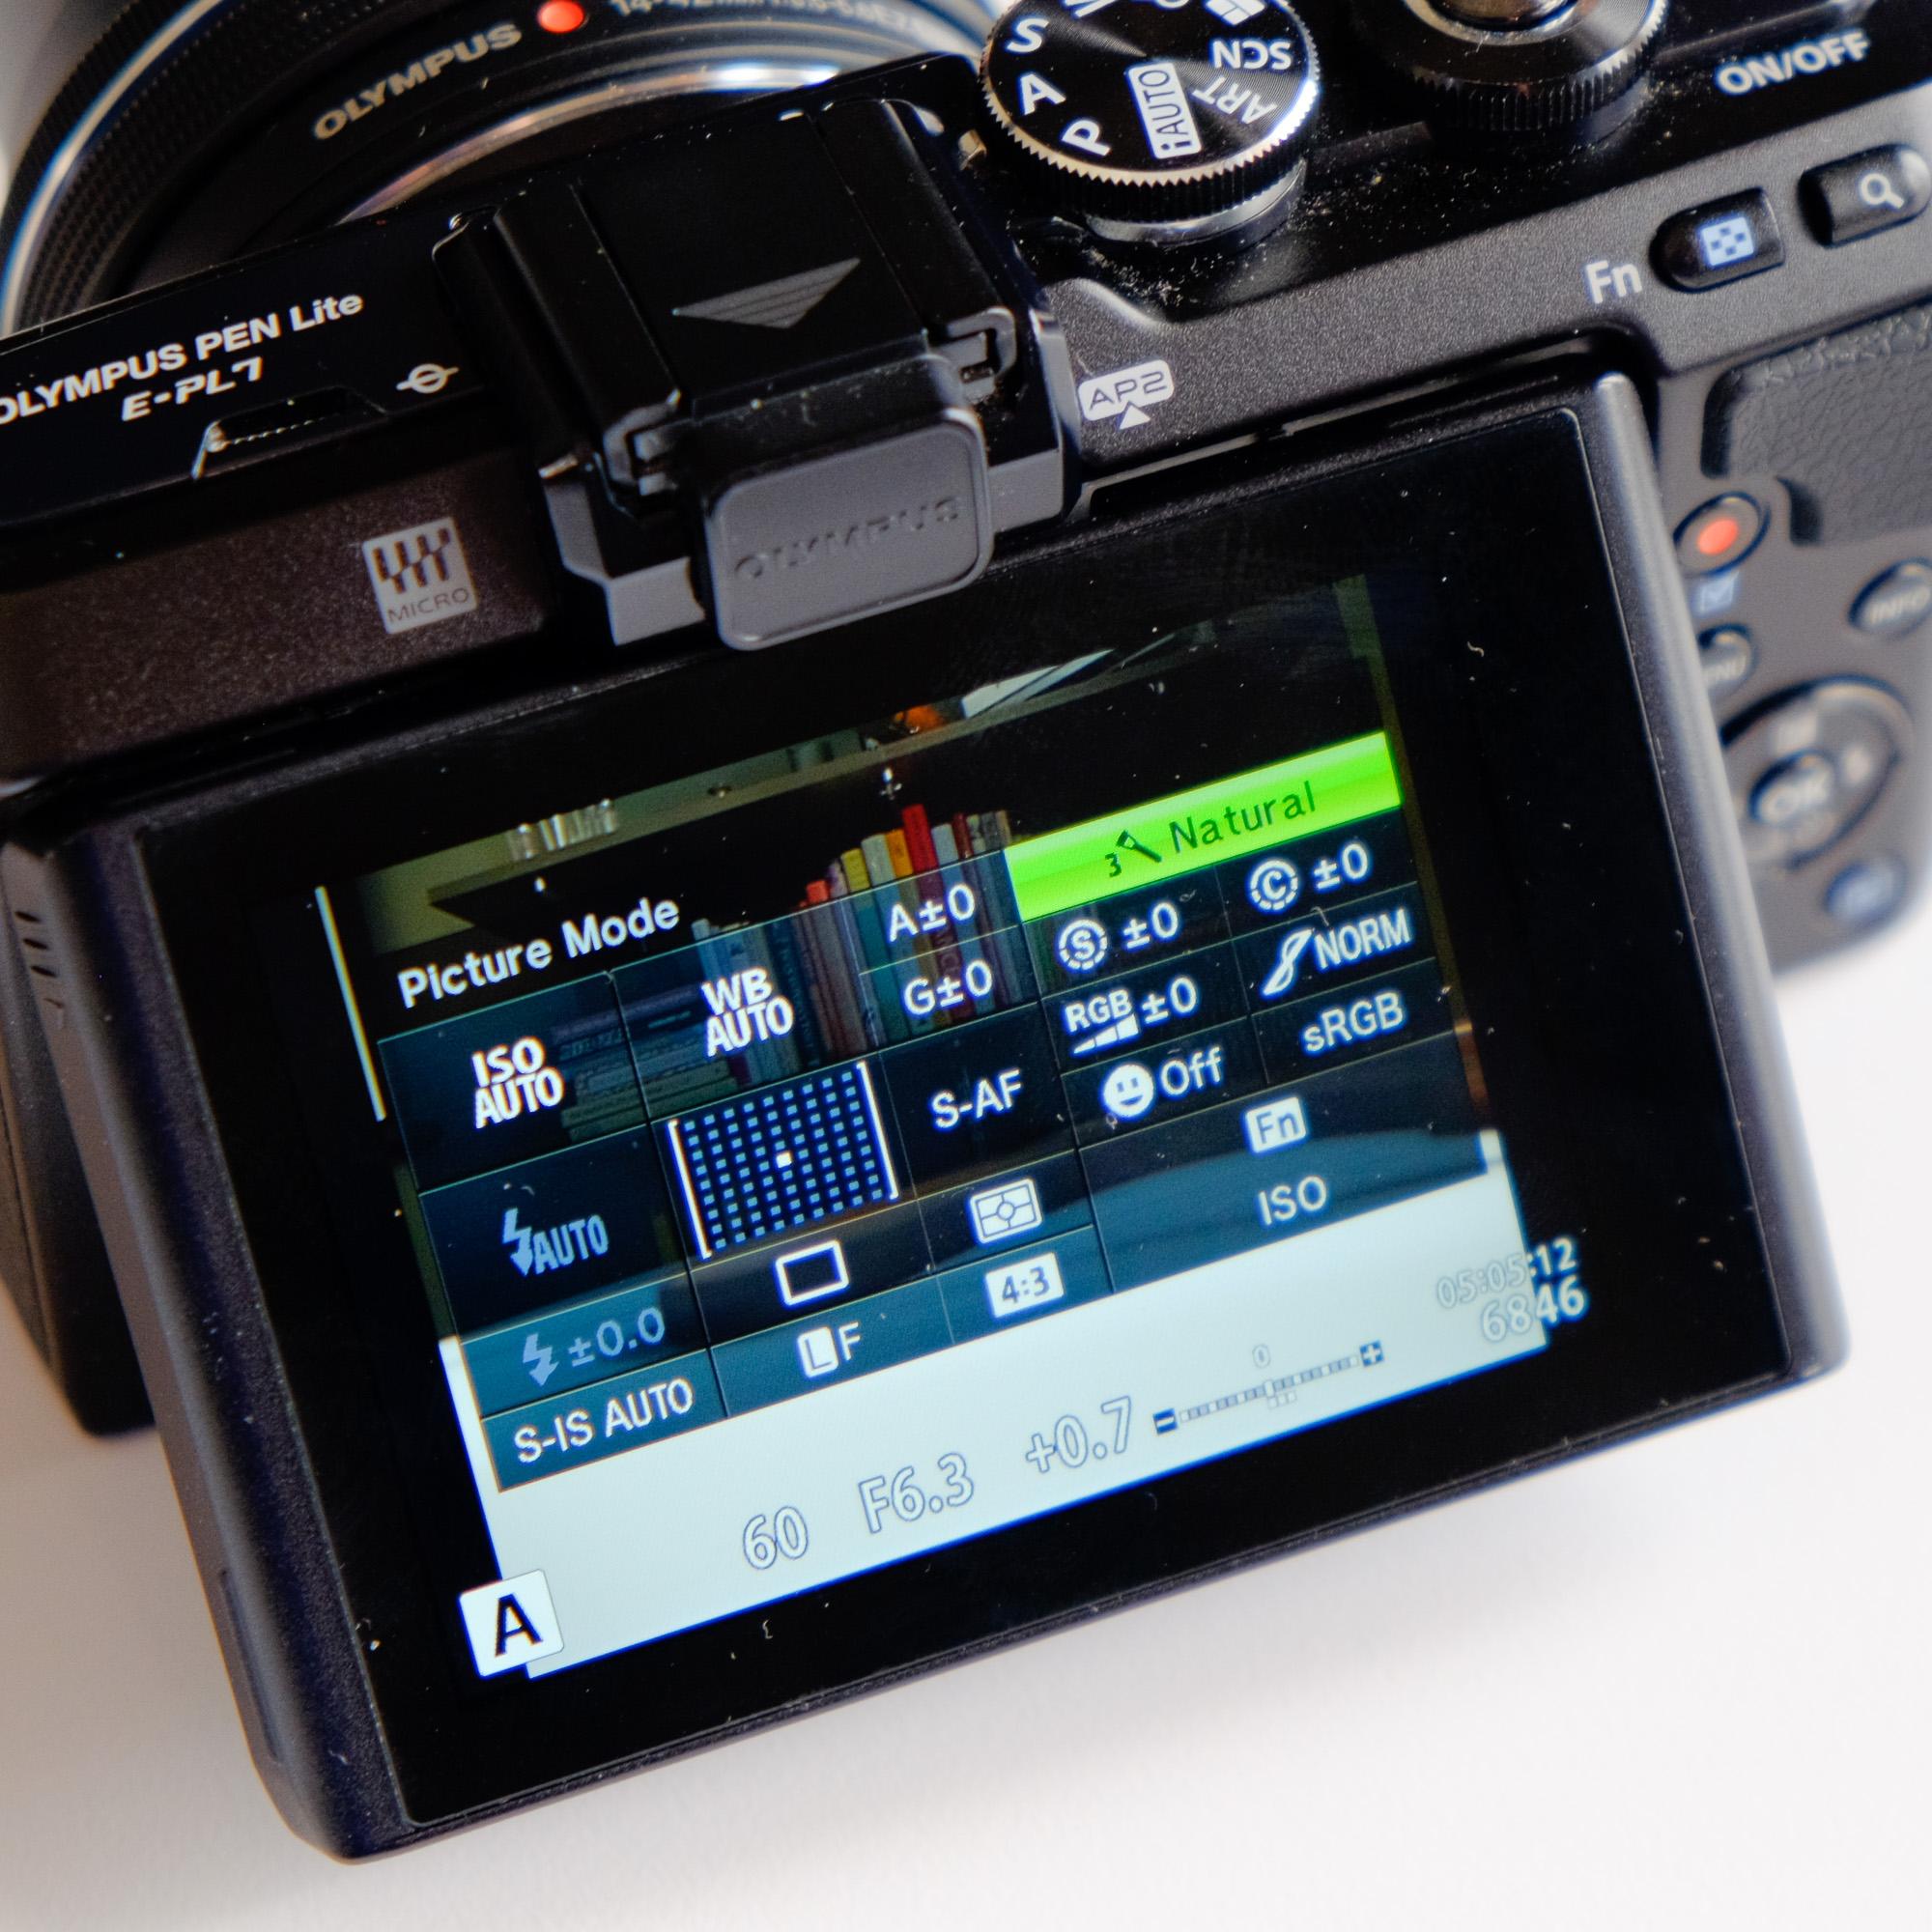 The Super Control Panel. Even nicer as the E-PL7 has a touchscreen